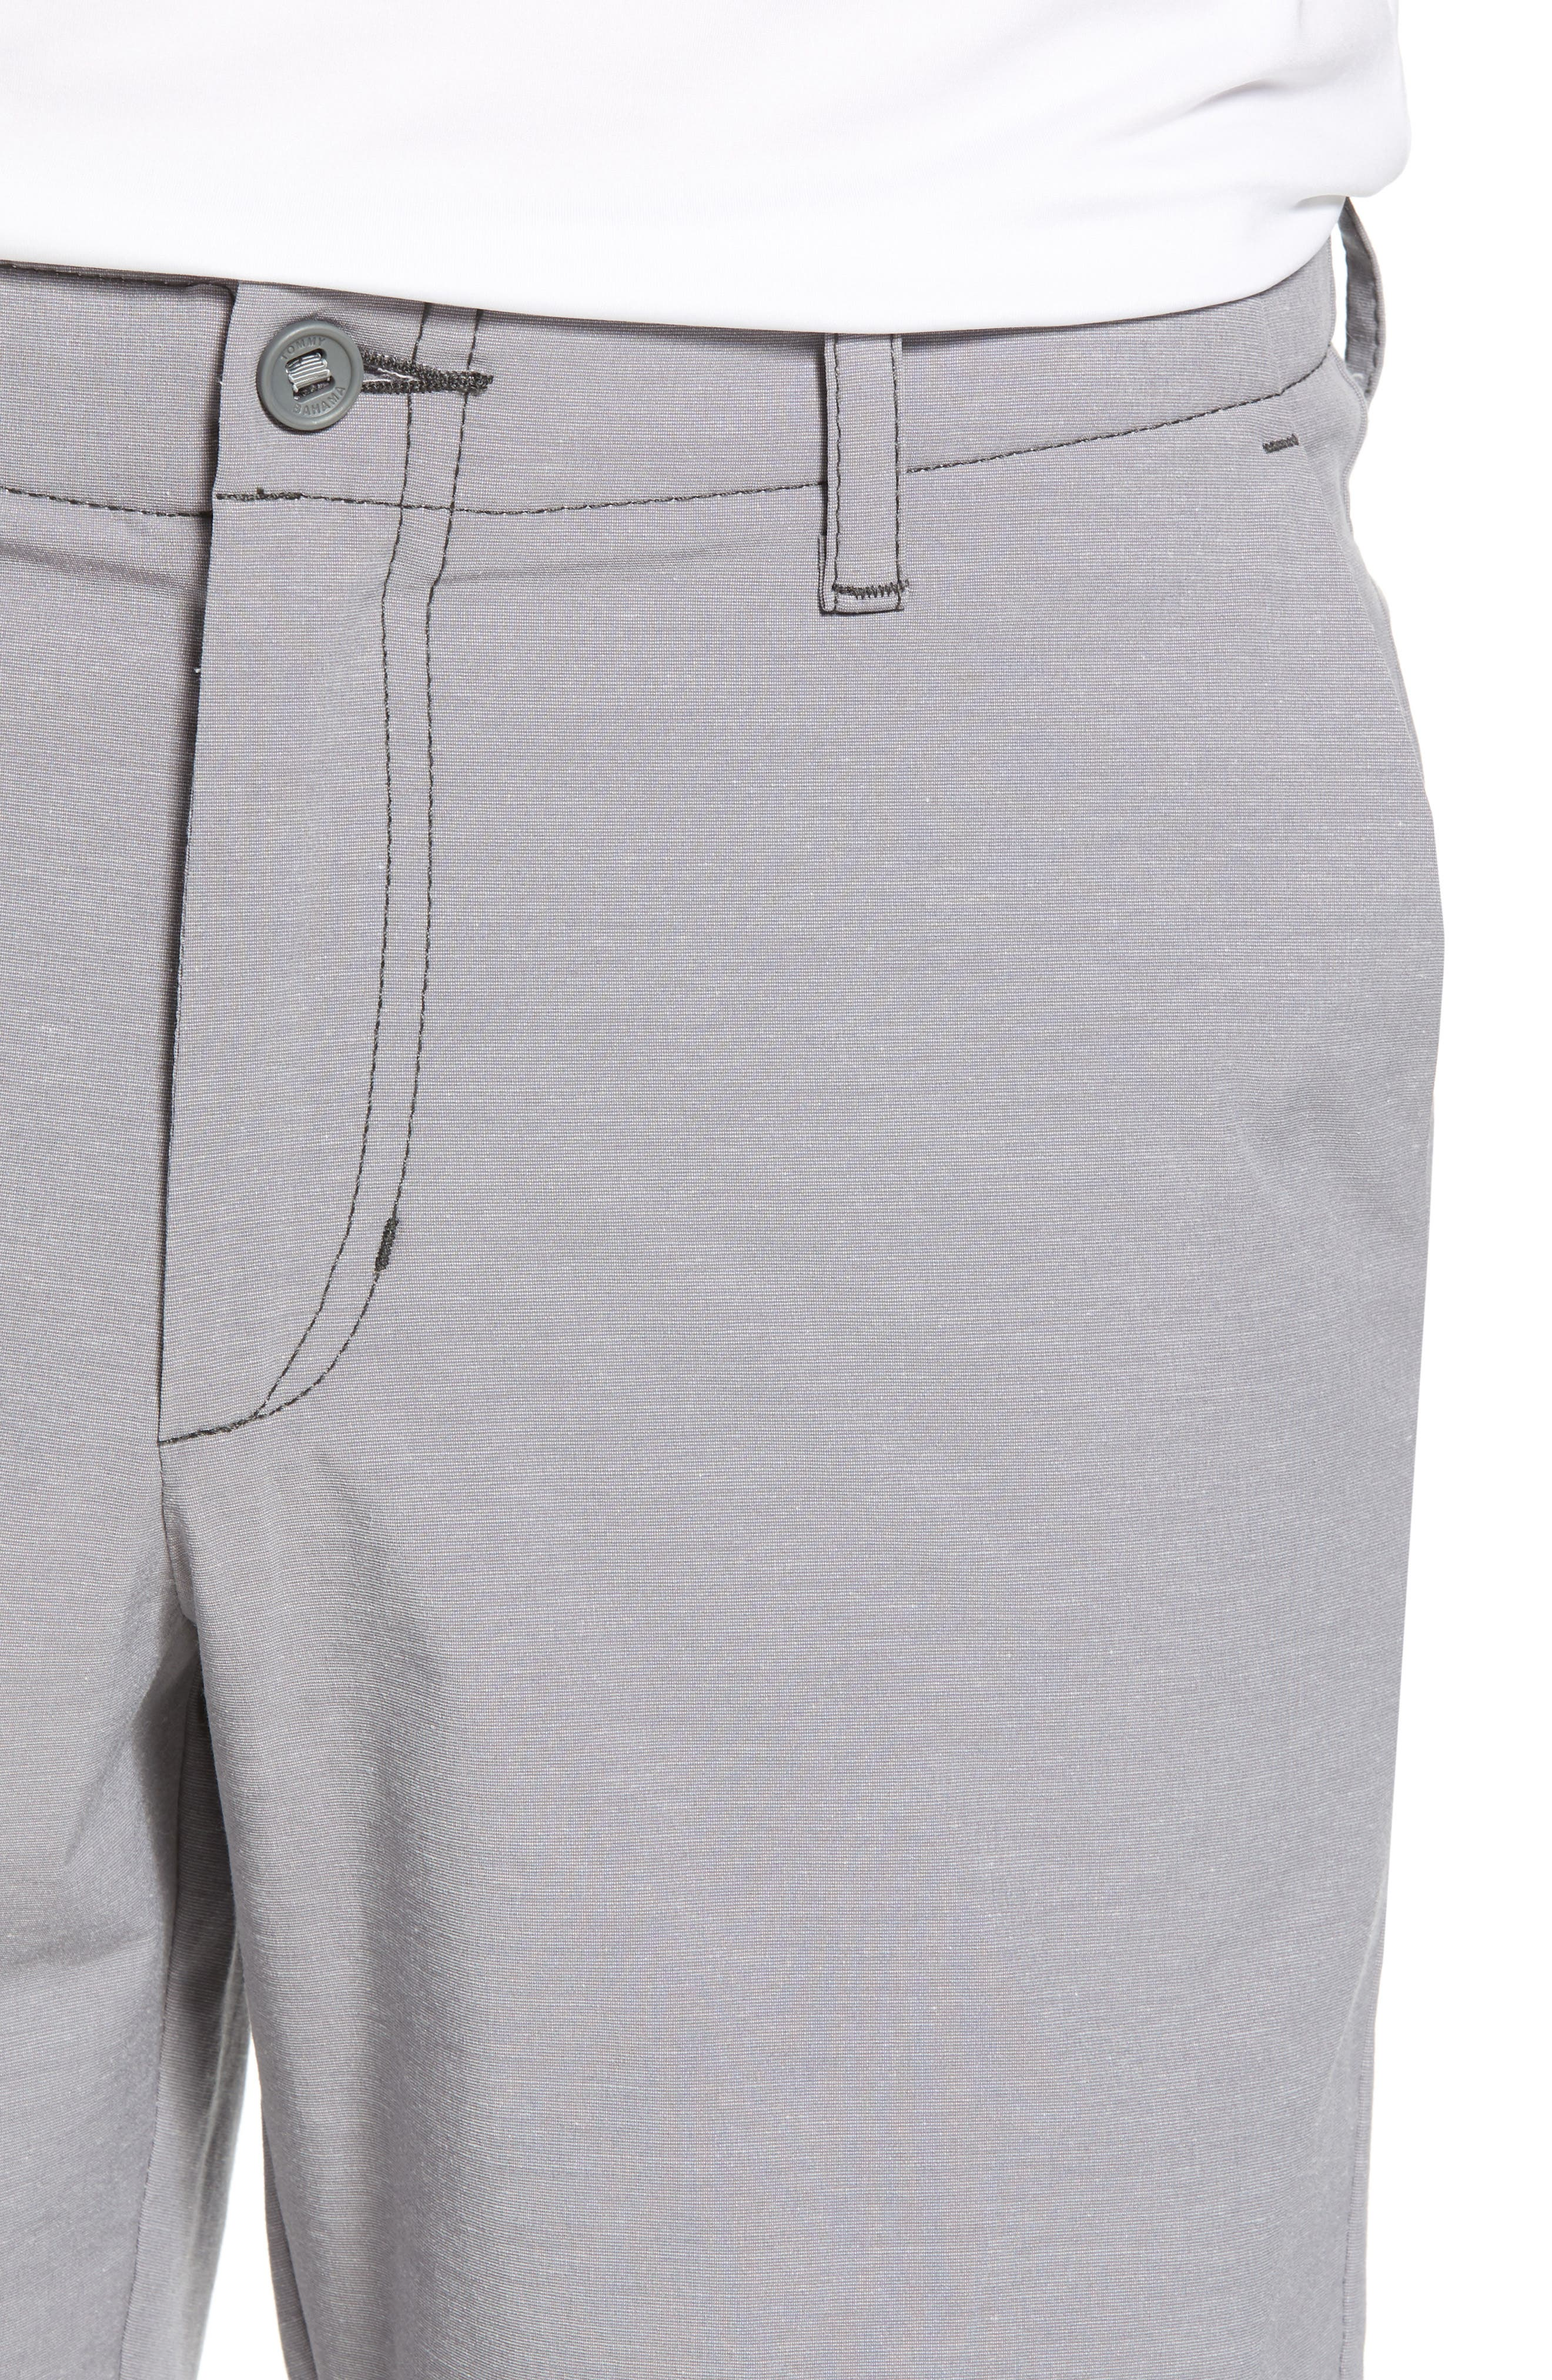 Chip & Run Shorts,                             Alternate thumbnail 4, color,                             Storm Gray